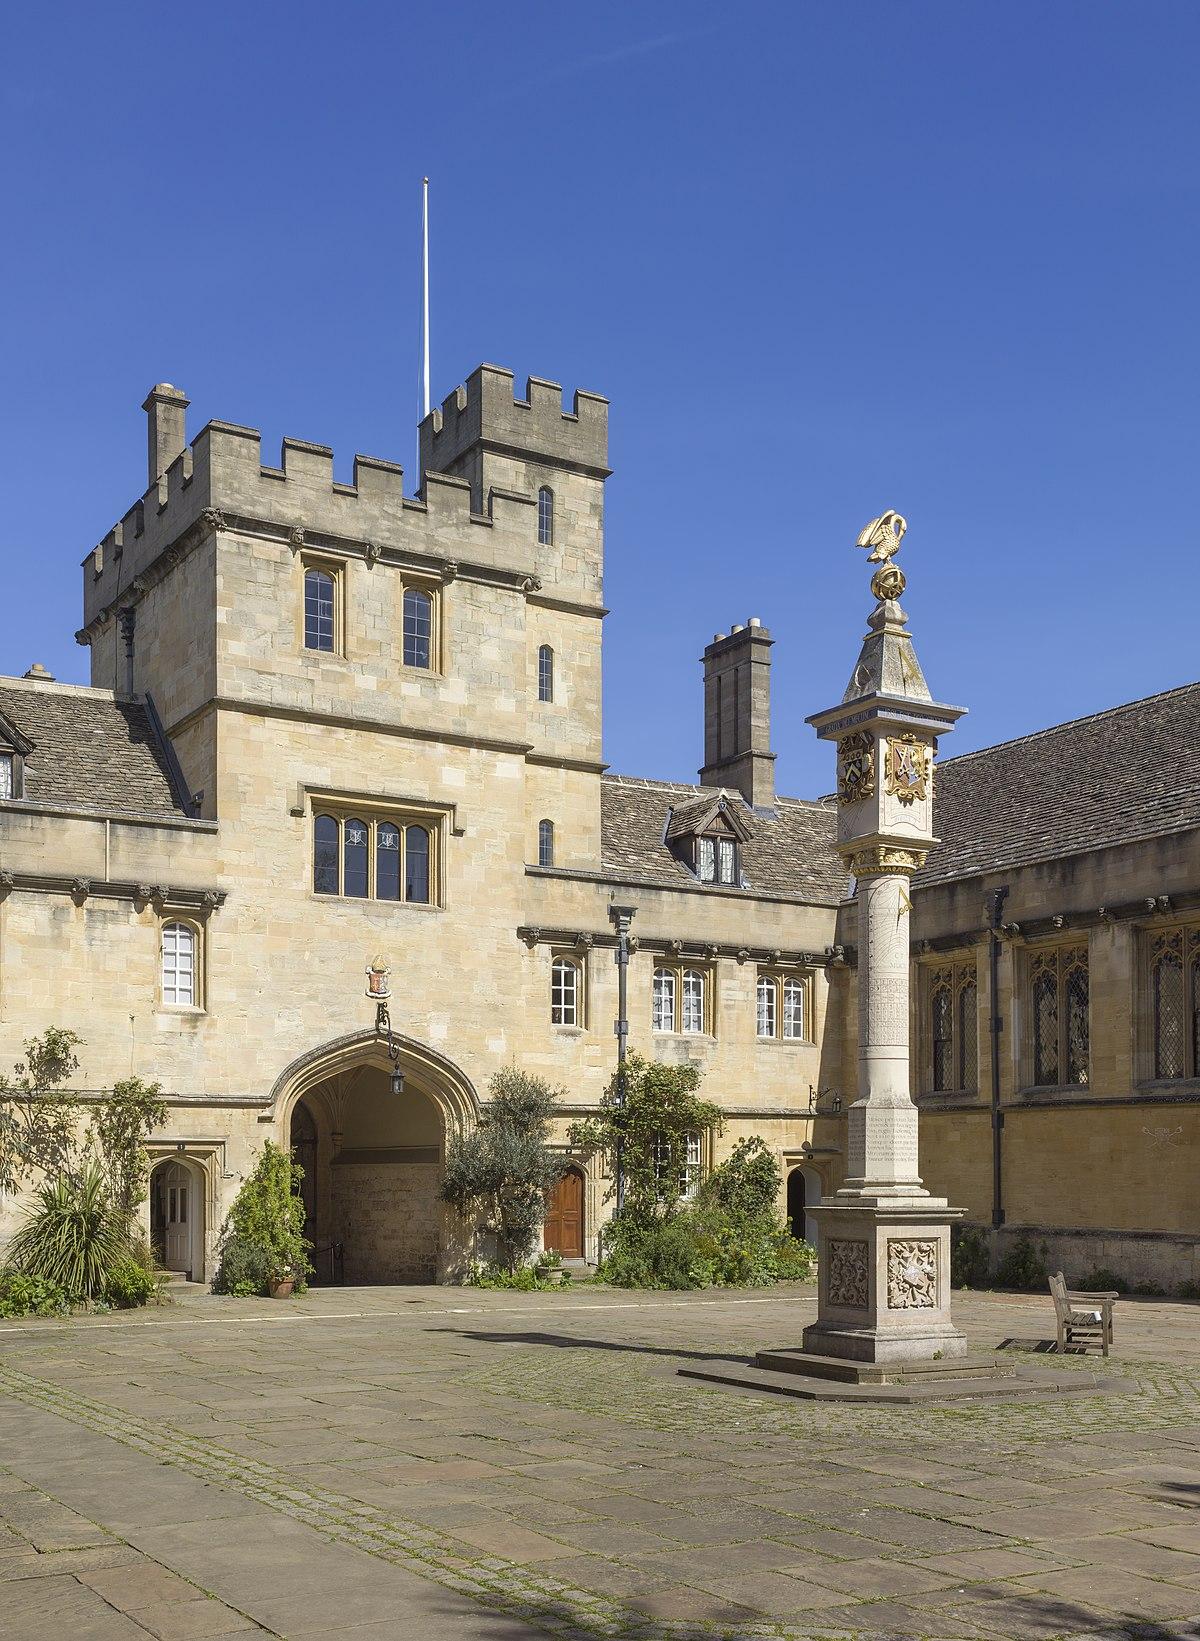 1200px-UK-2014-Oxford-Corpus_Christi_College_02.jpg